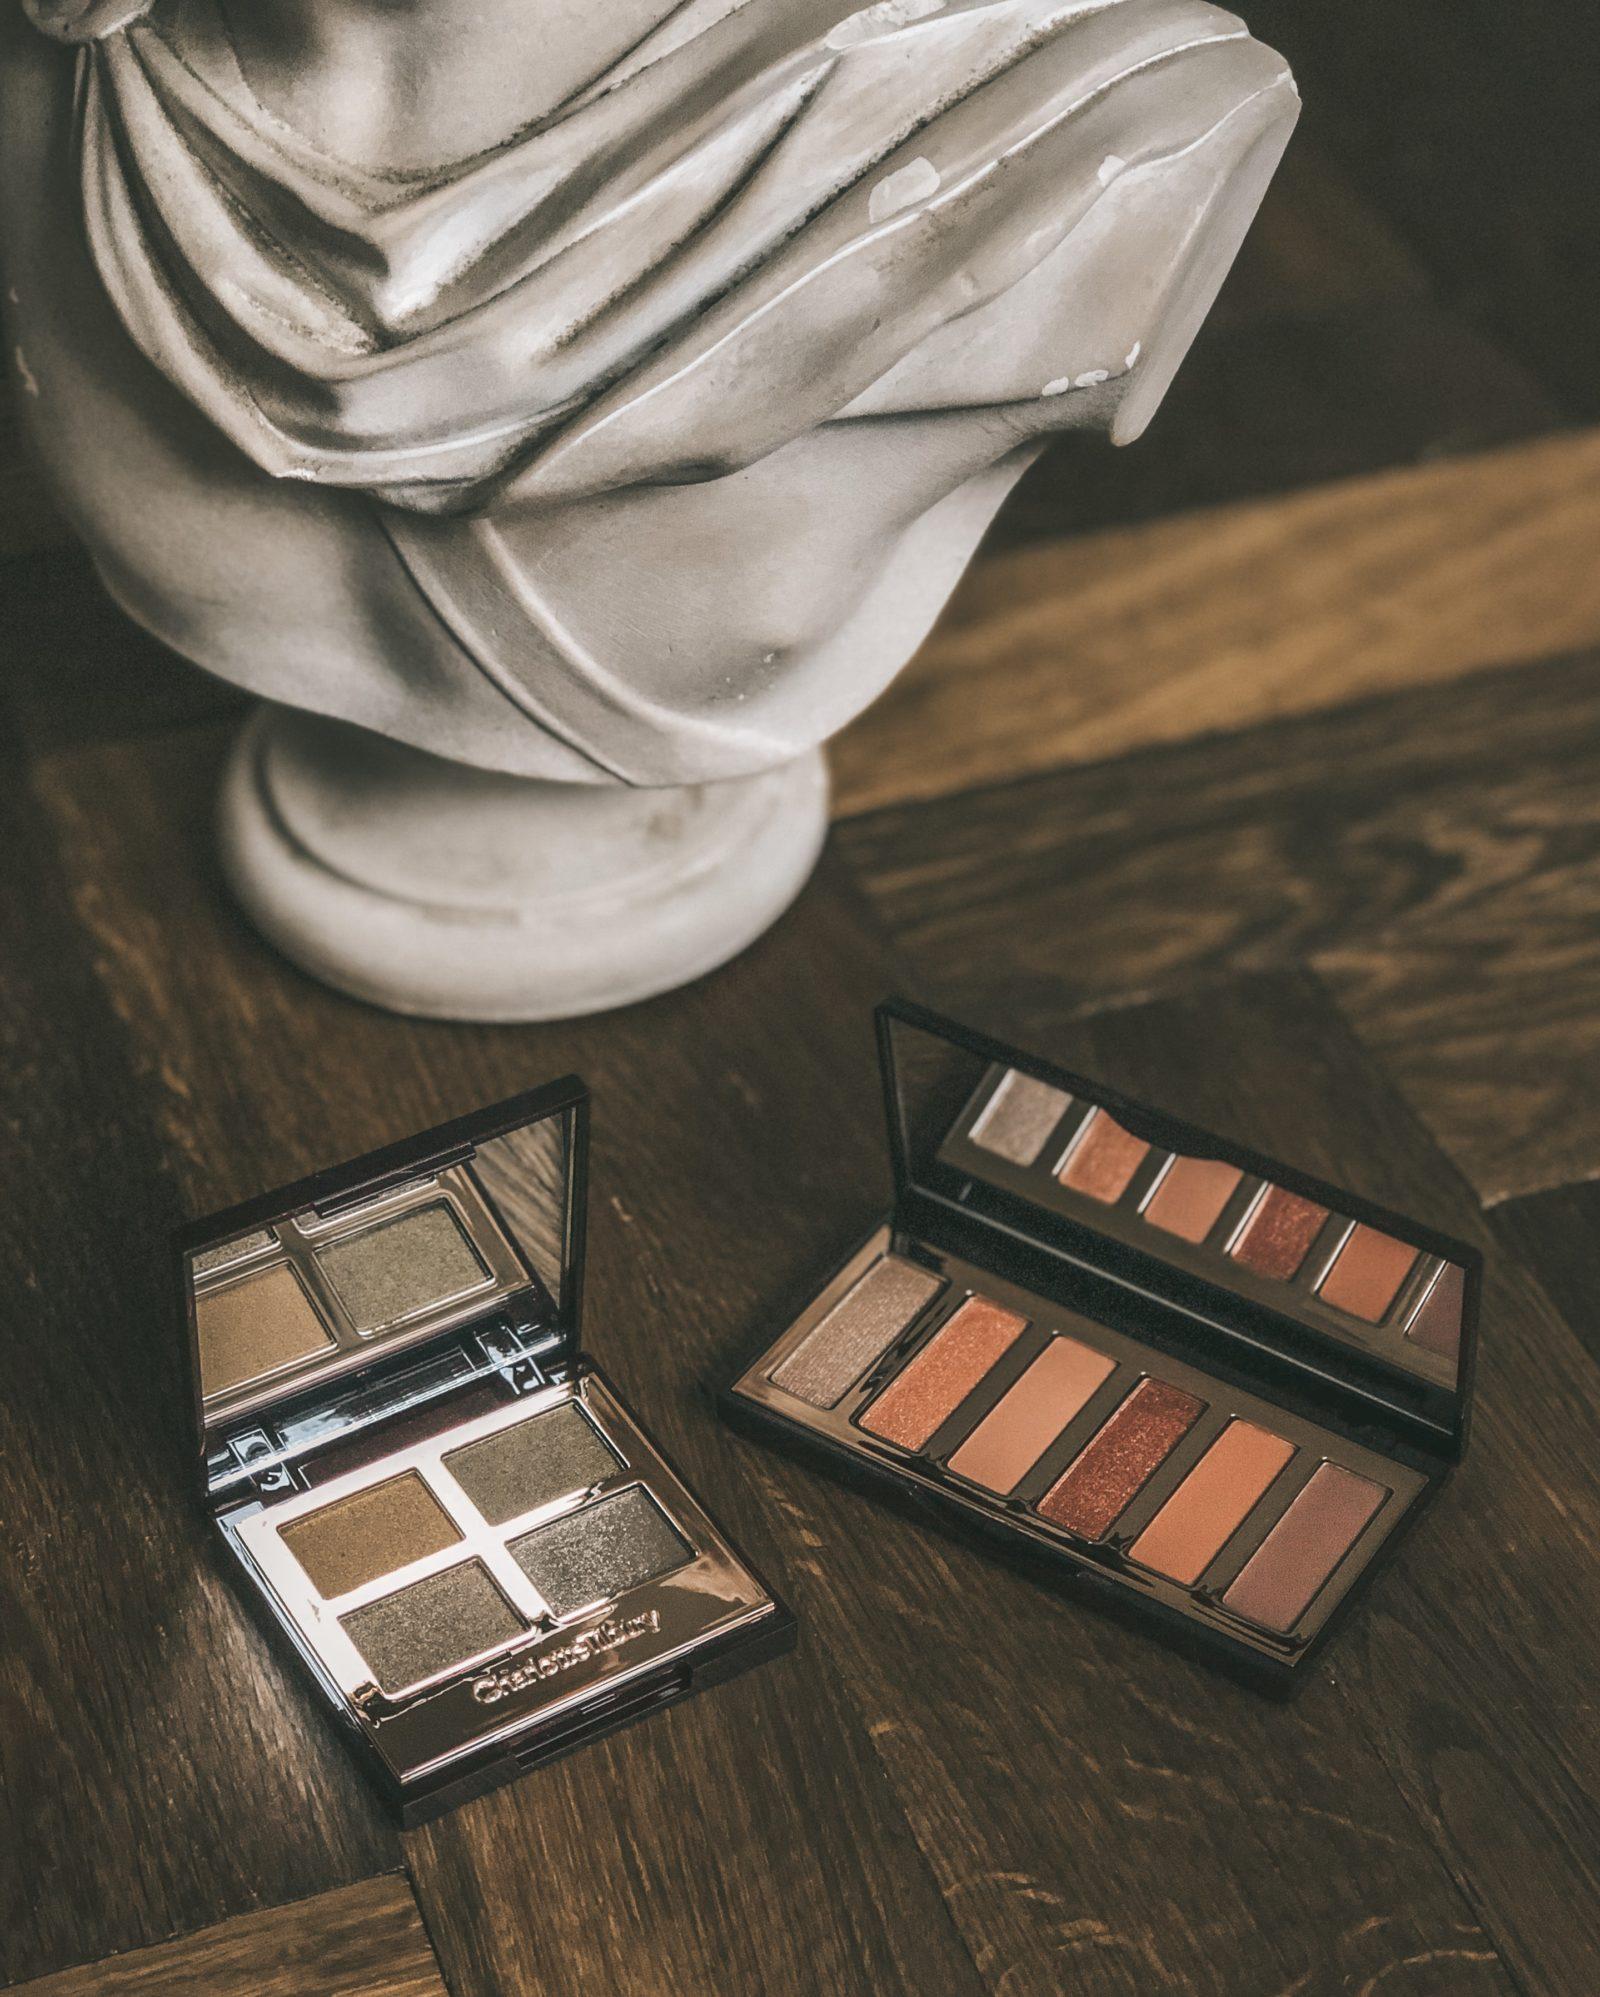 Selfridges Beauty - Charlotte Tilbury Eye Shadow Palette